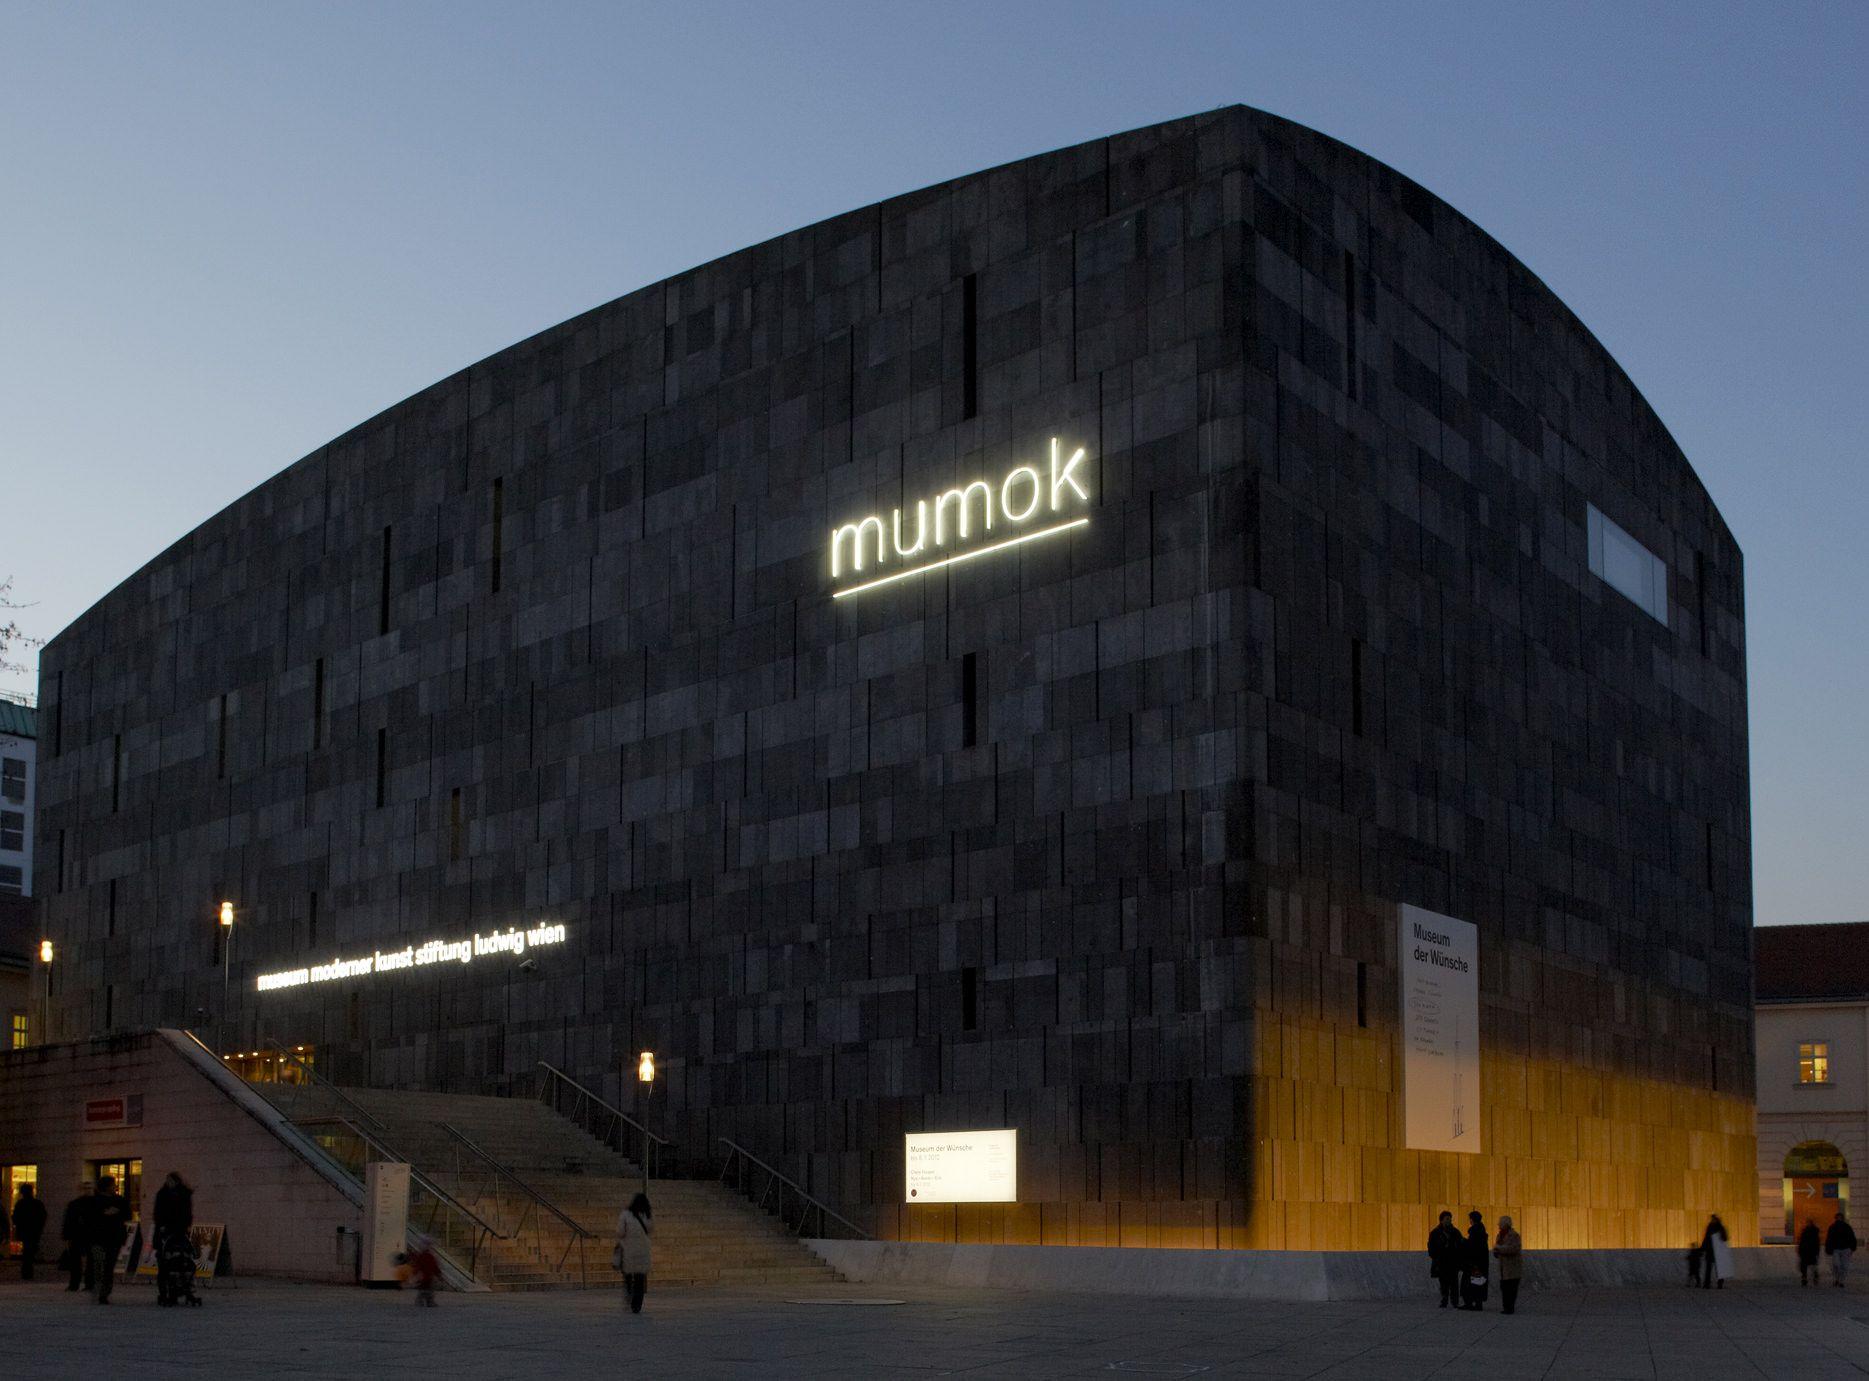 Mumok Museum Moderner Kunst Museum Of Modern Art Vienna Austria Vacation Plan Visiting Places To Visit